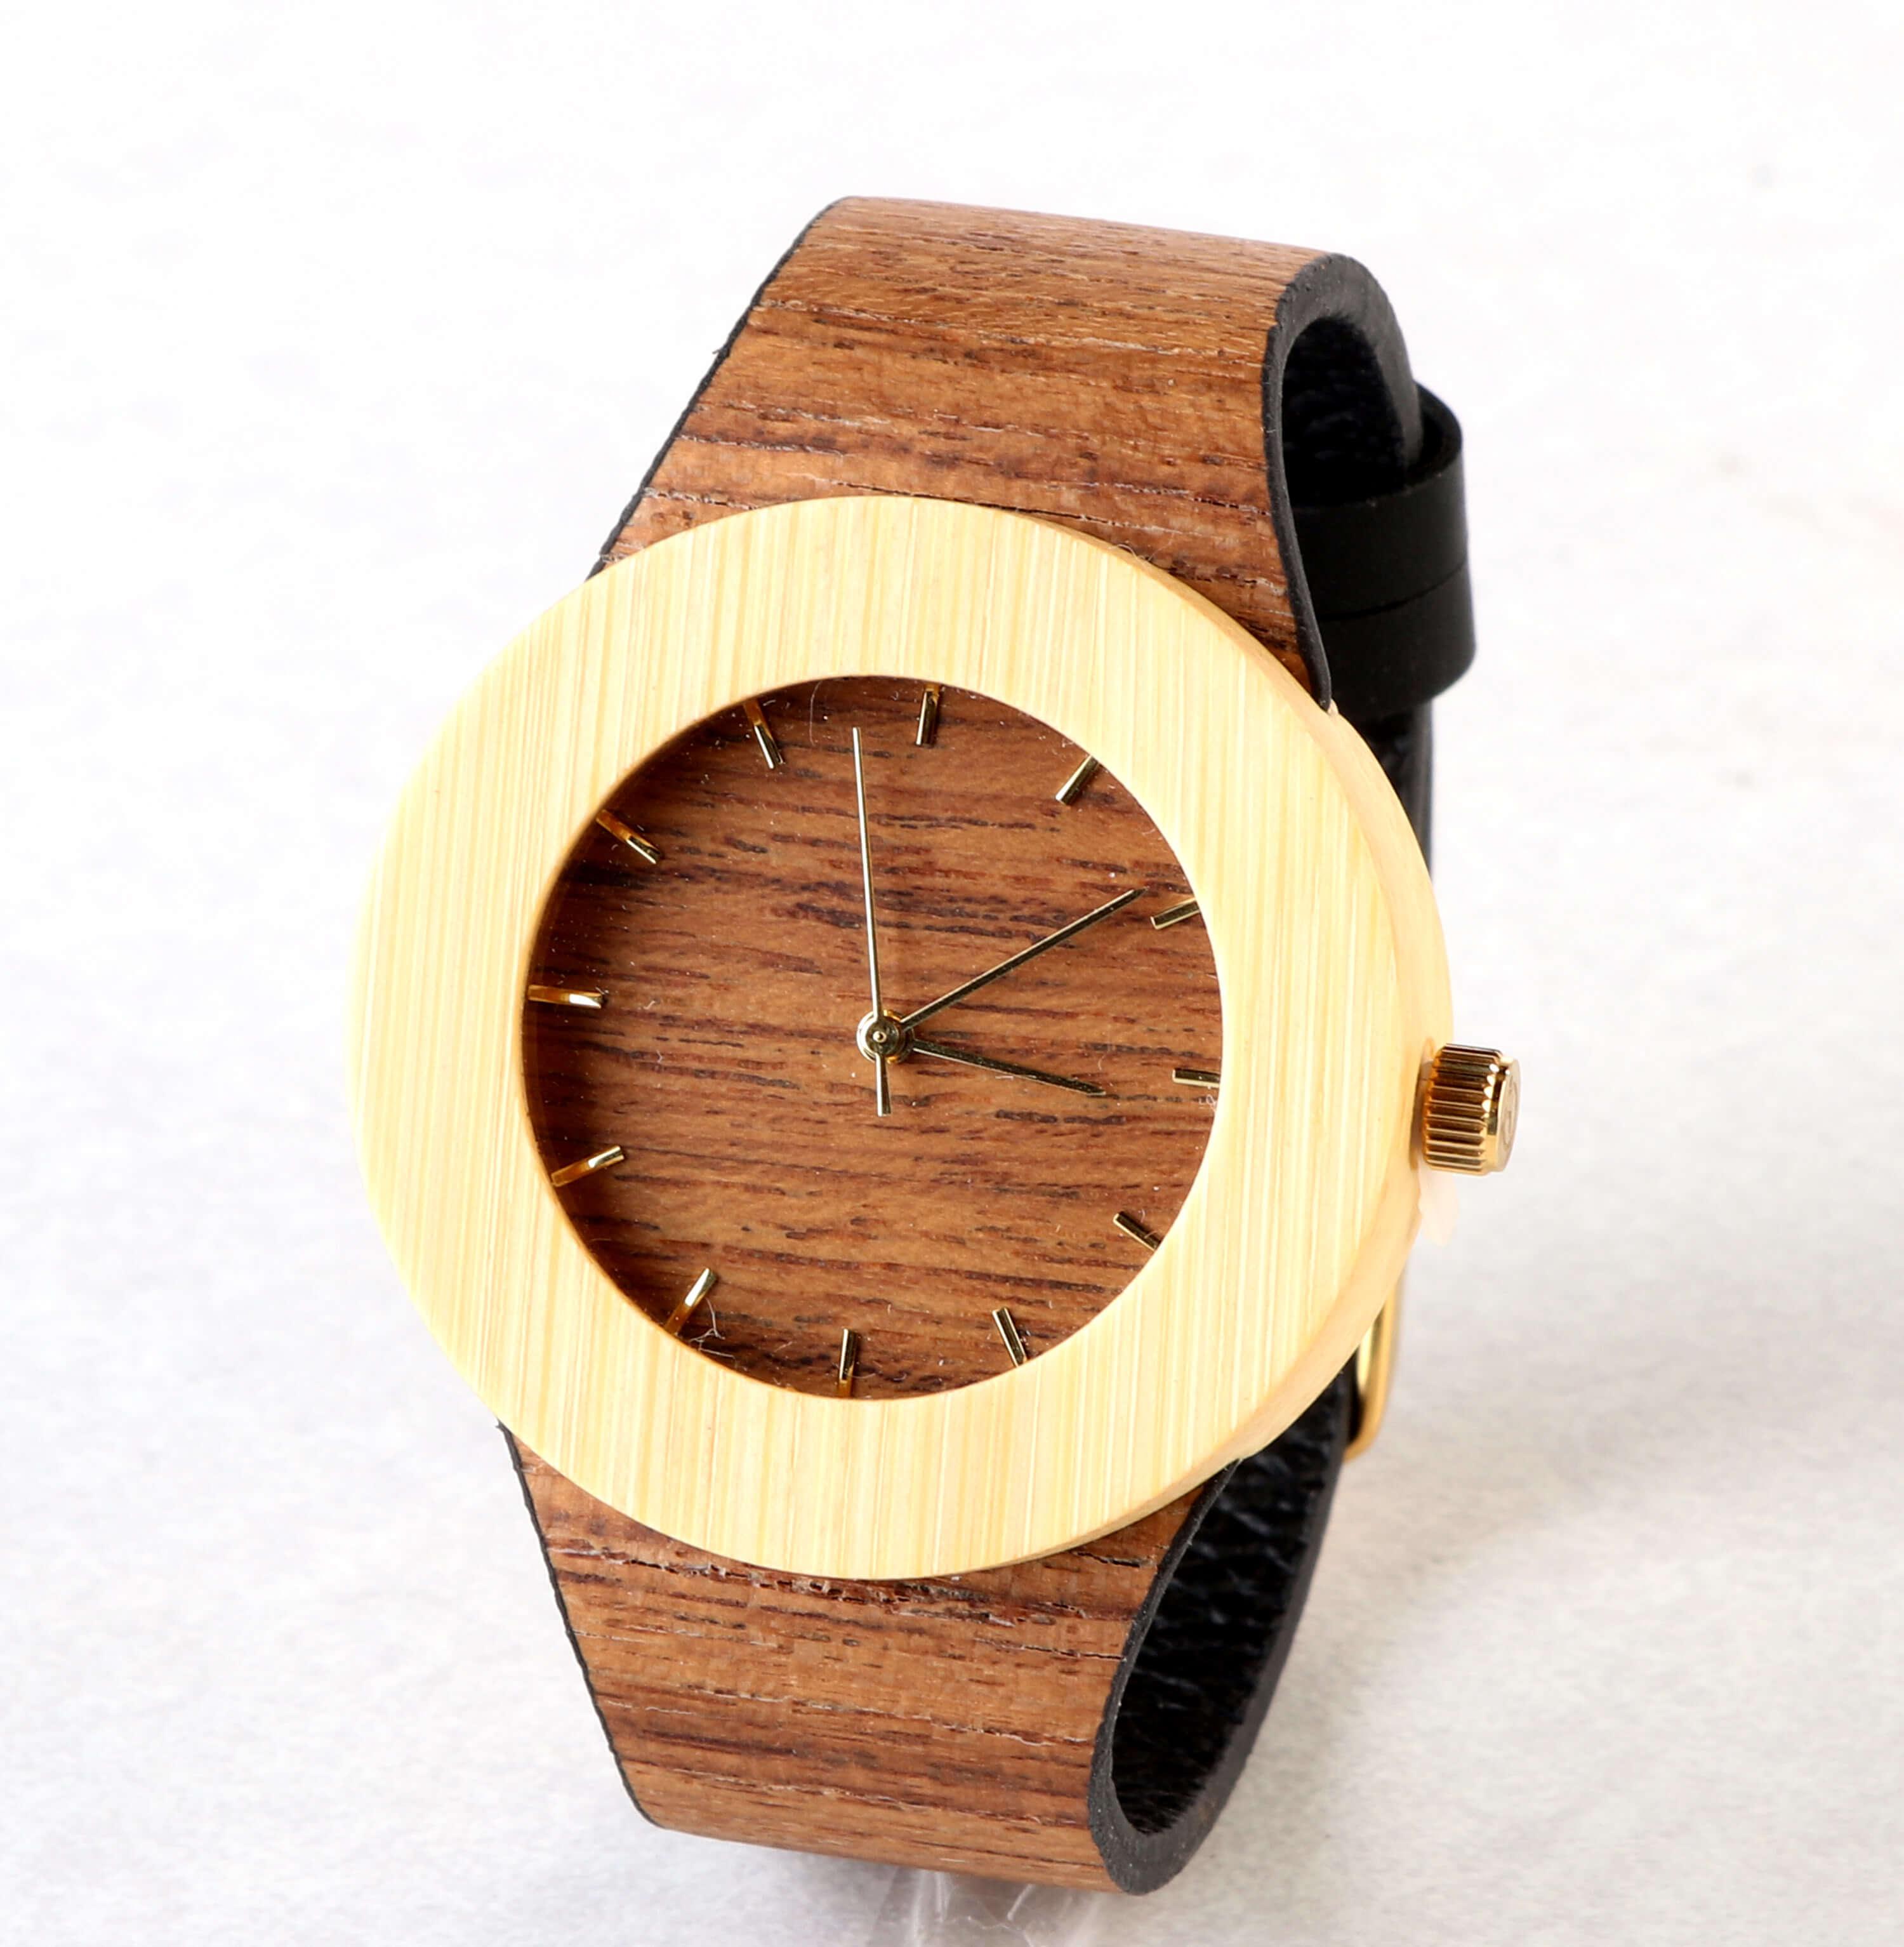 Analog Watch Co. Watch